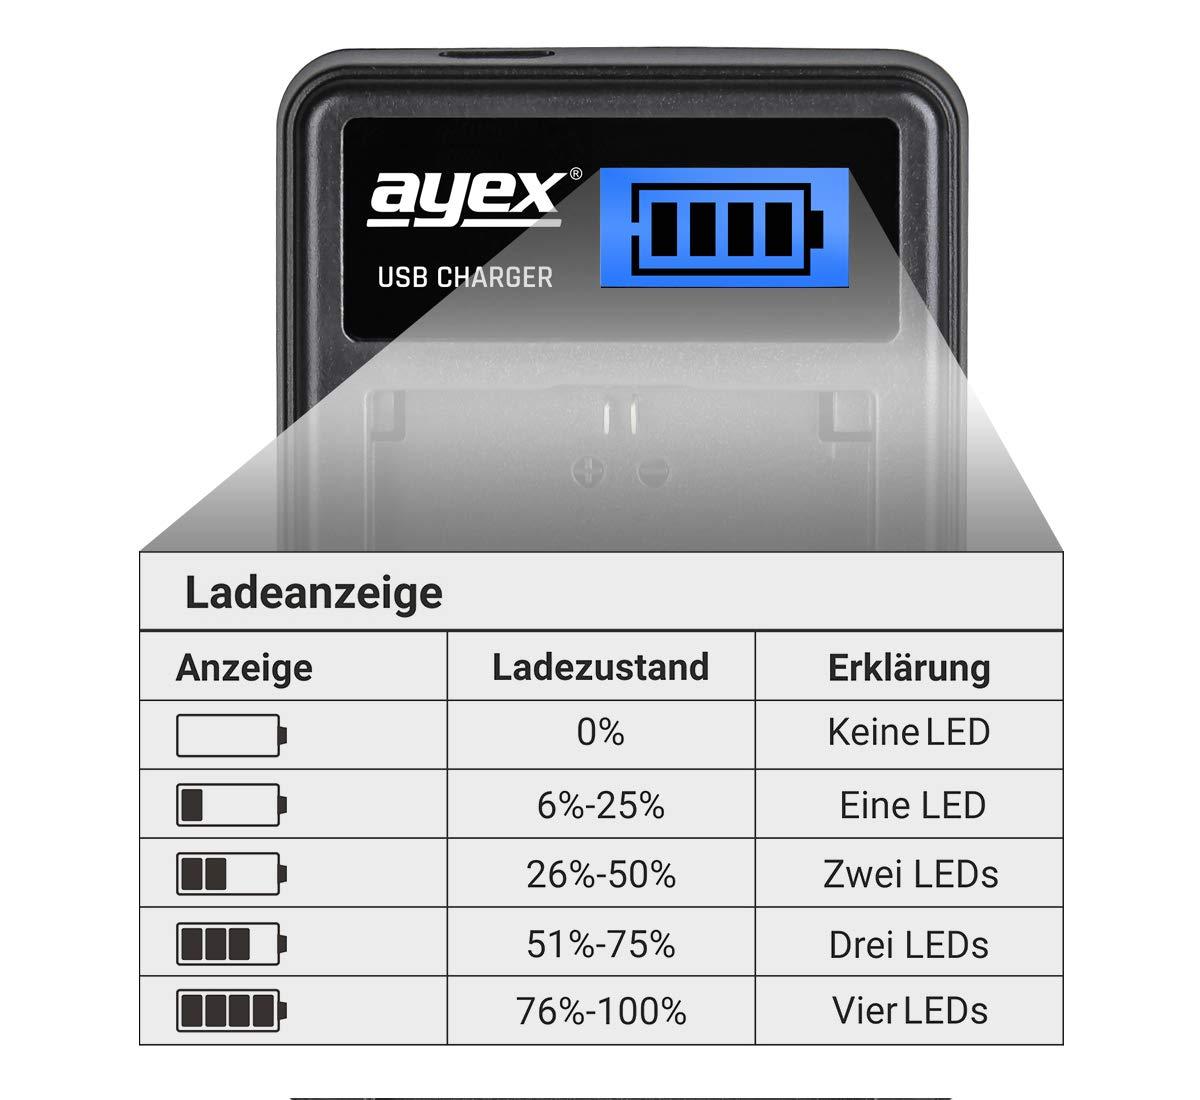 ayex USB Dual Charger Ladegerät für Panasonic DMW-BMB9 DMW-BMB9E Kamera-Akkus